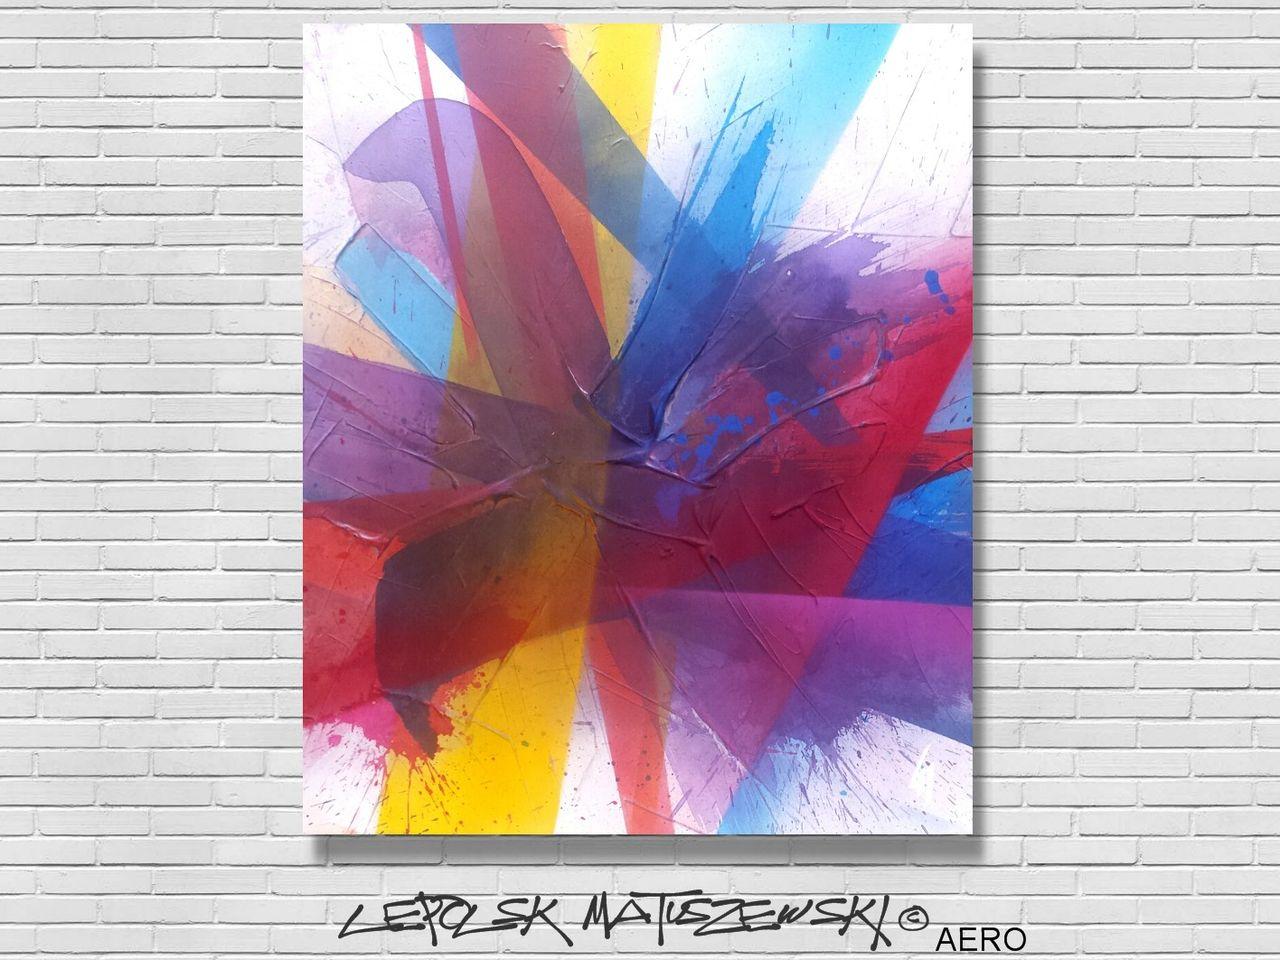 MISTER K  (Lepolsk Matuszewski) AERO  lepolsk abstract expressionnism 2016